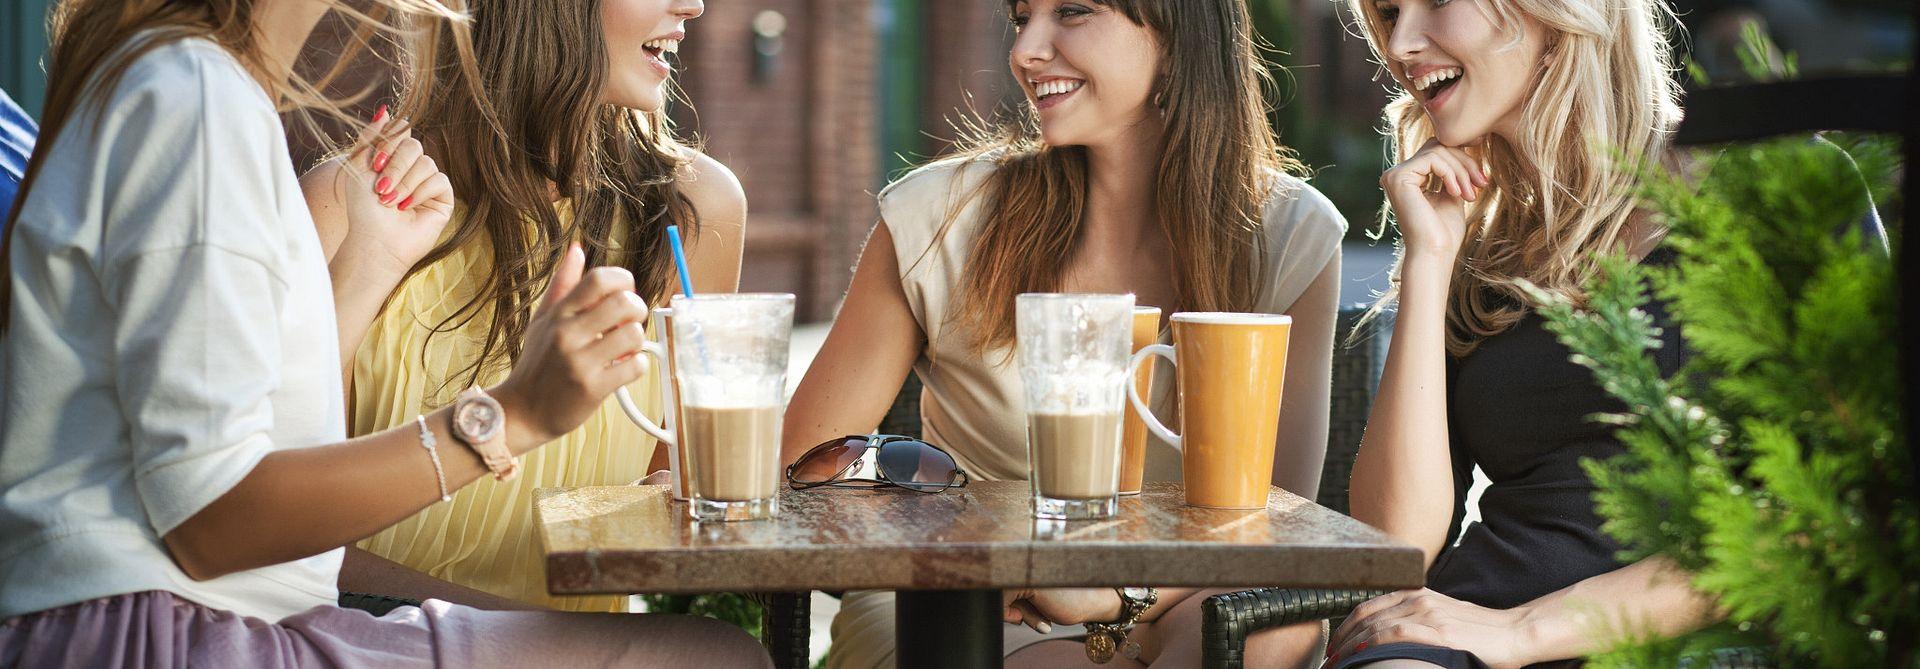 Friends enjoying coffee